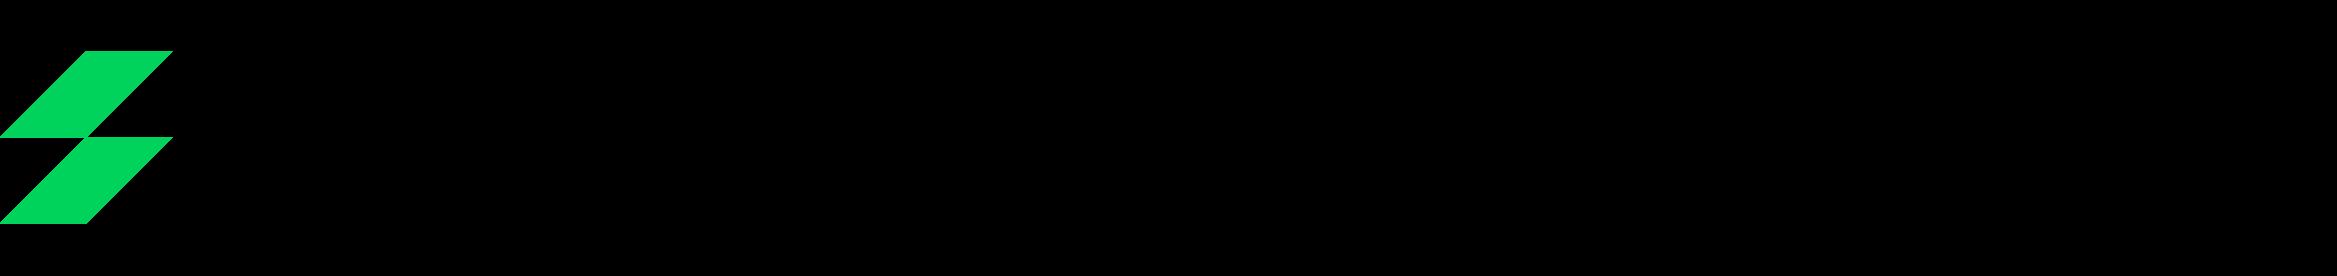 NUFC-SG-hor